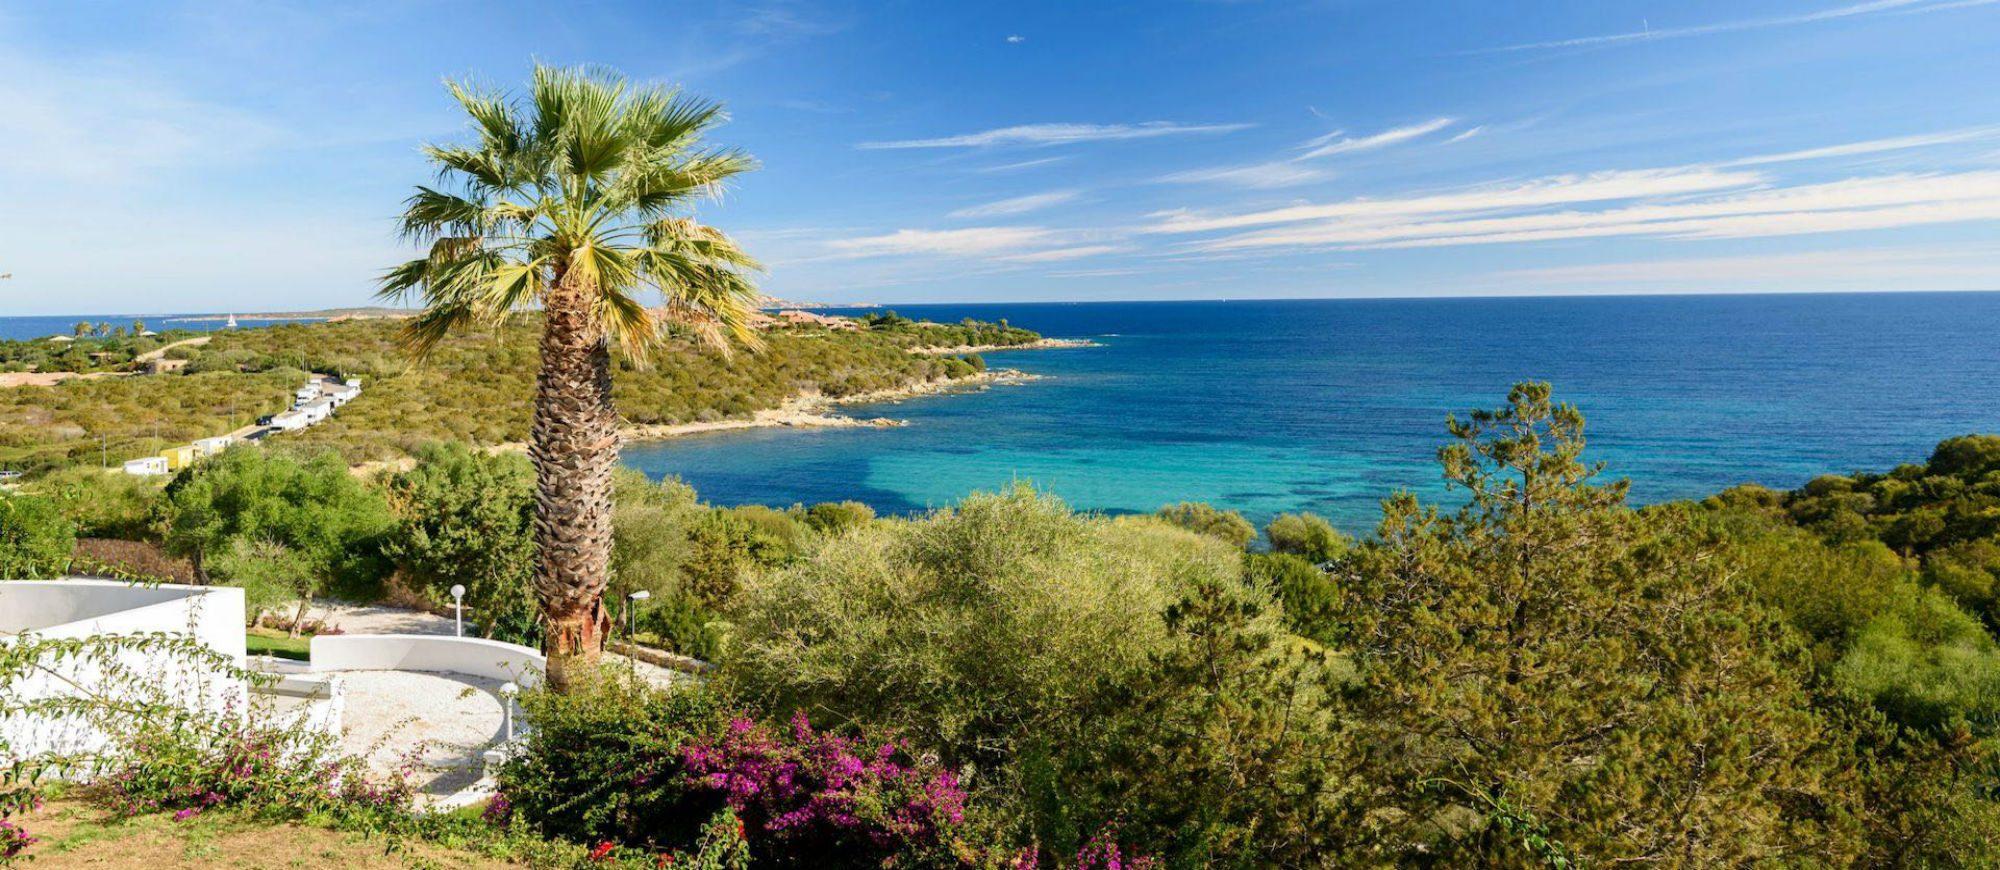 Porto Rotondo Sea Breeze Sardinian Luxury